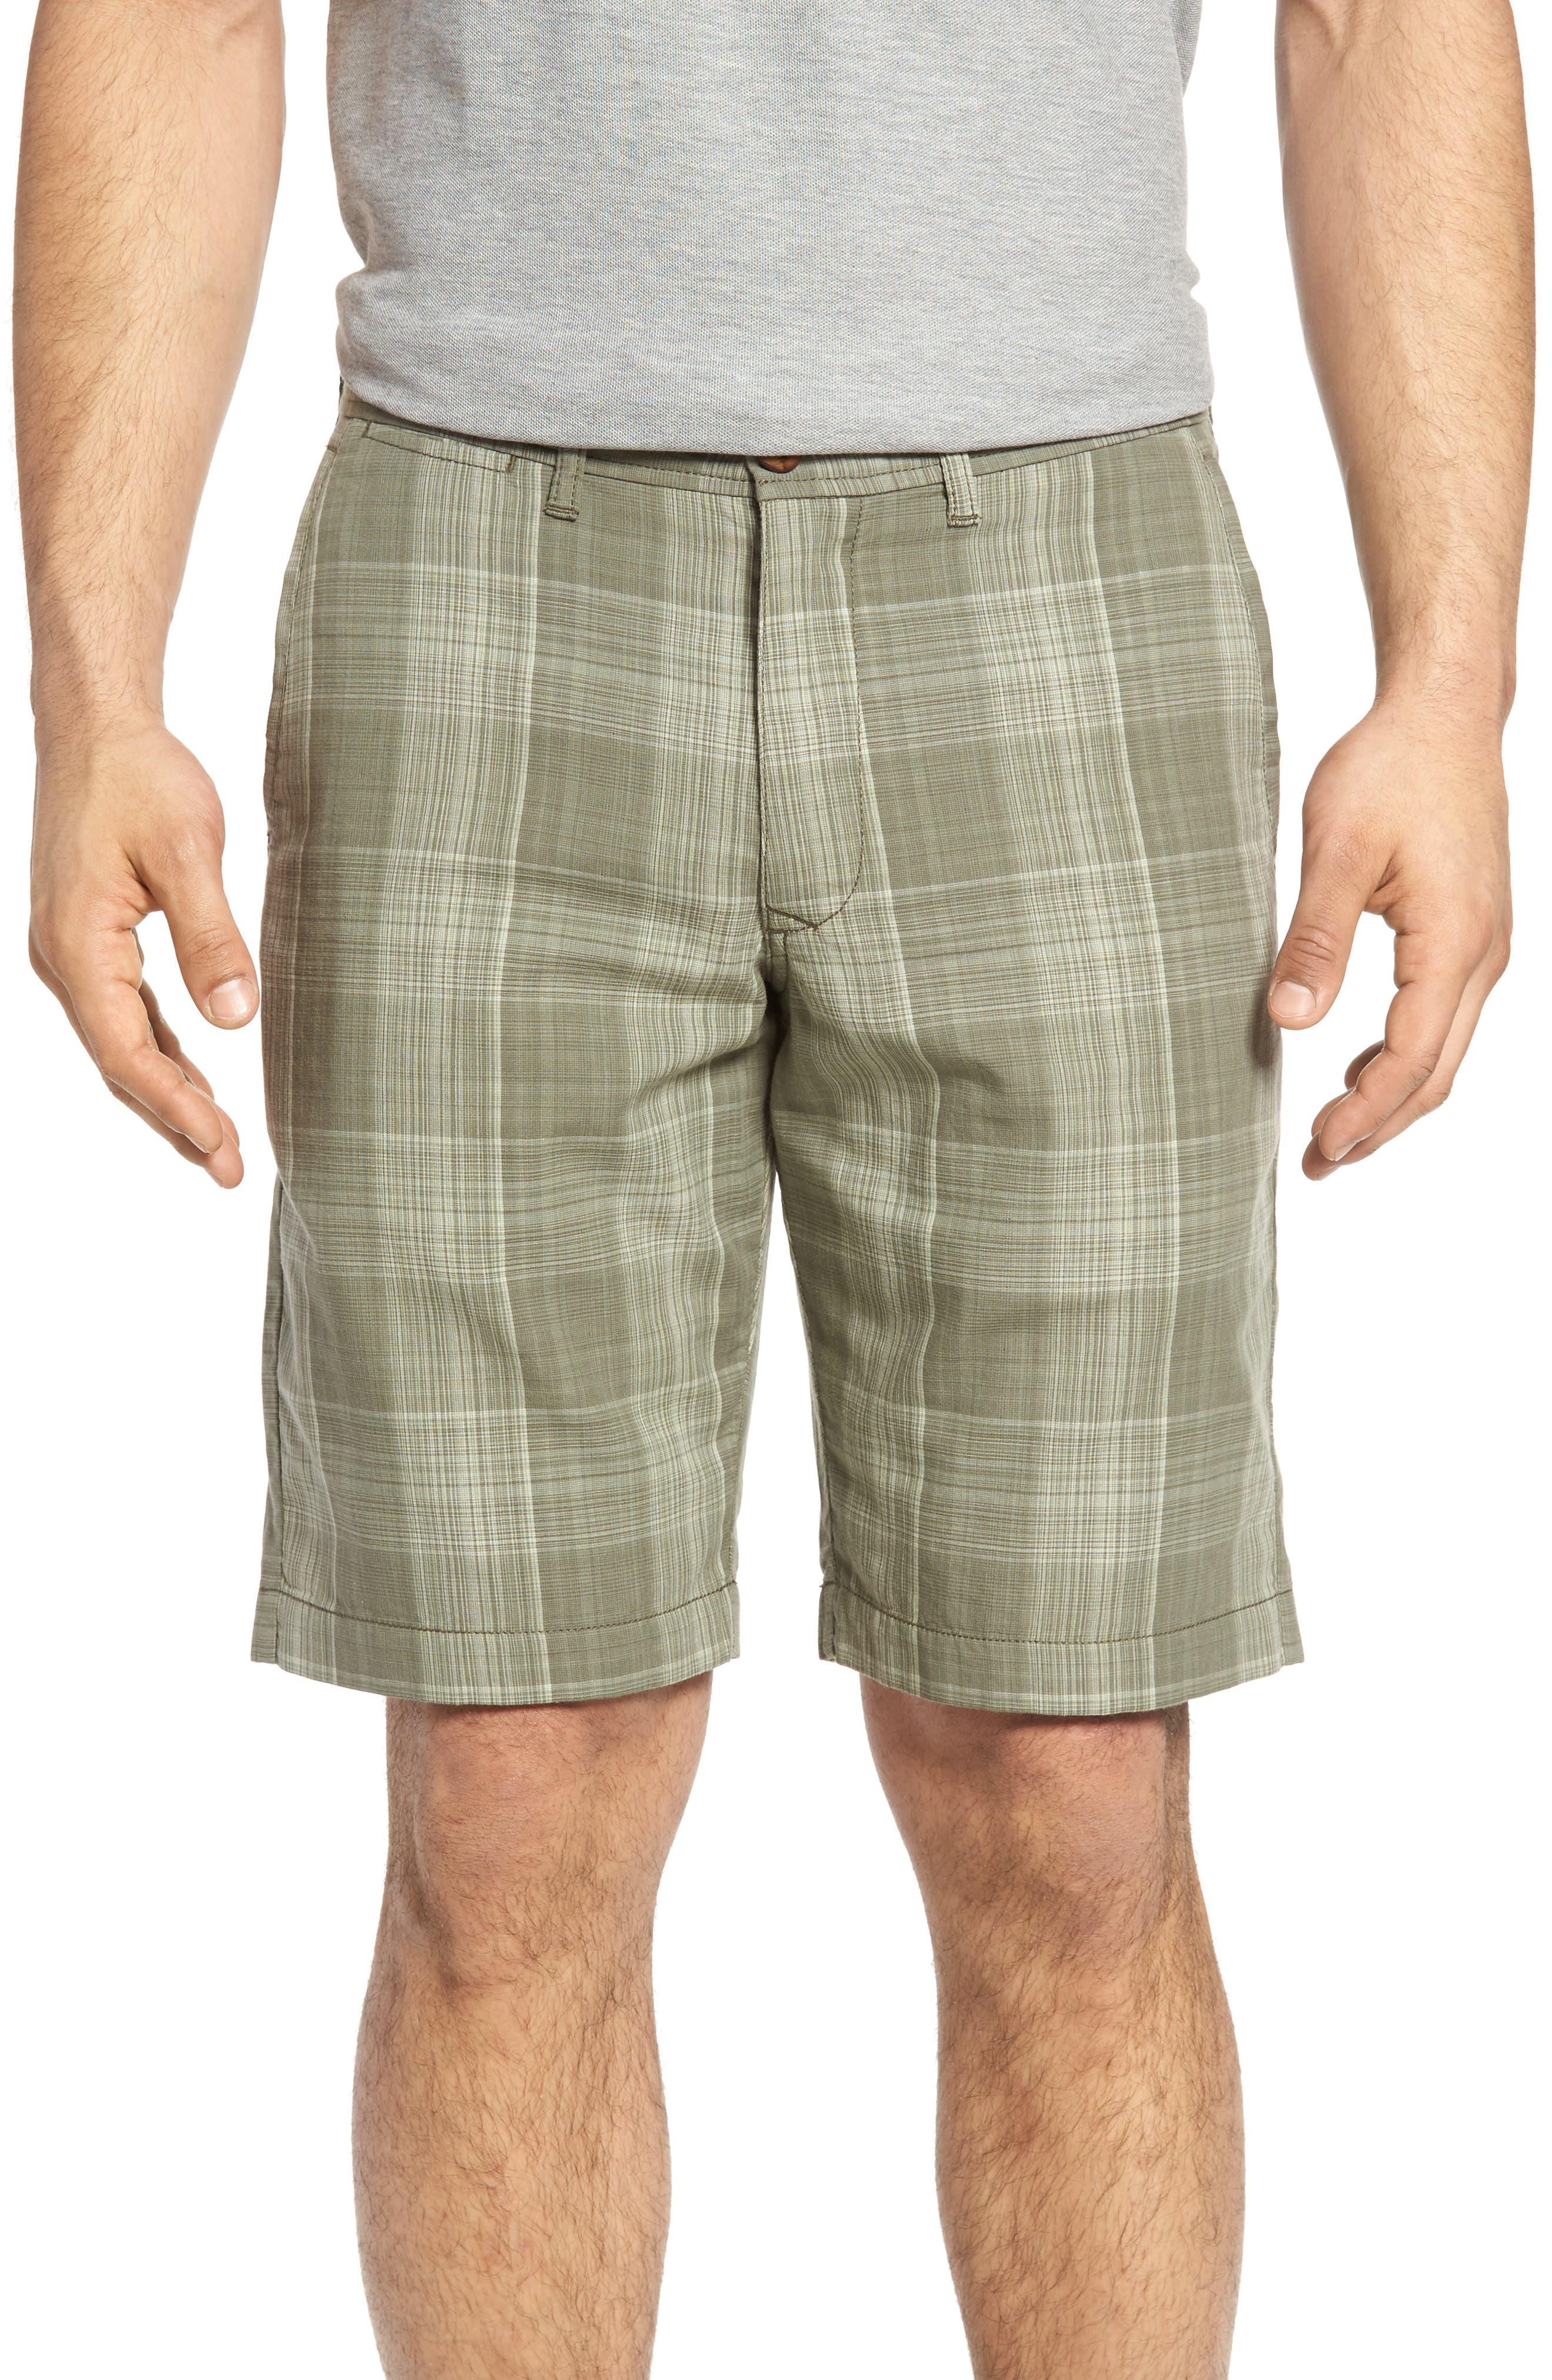 Tommy Bahama Dayboard Plaid Shorts (Regular & Big)